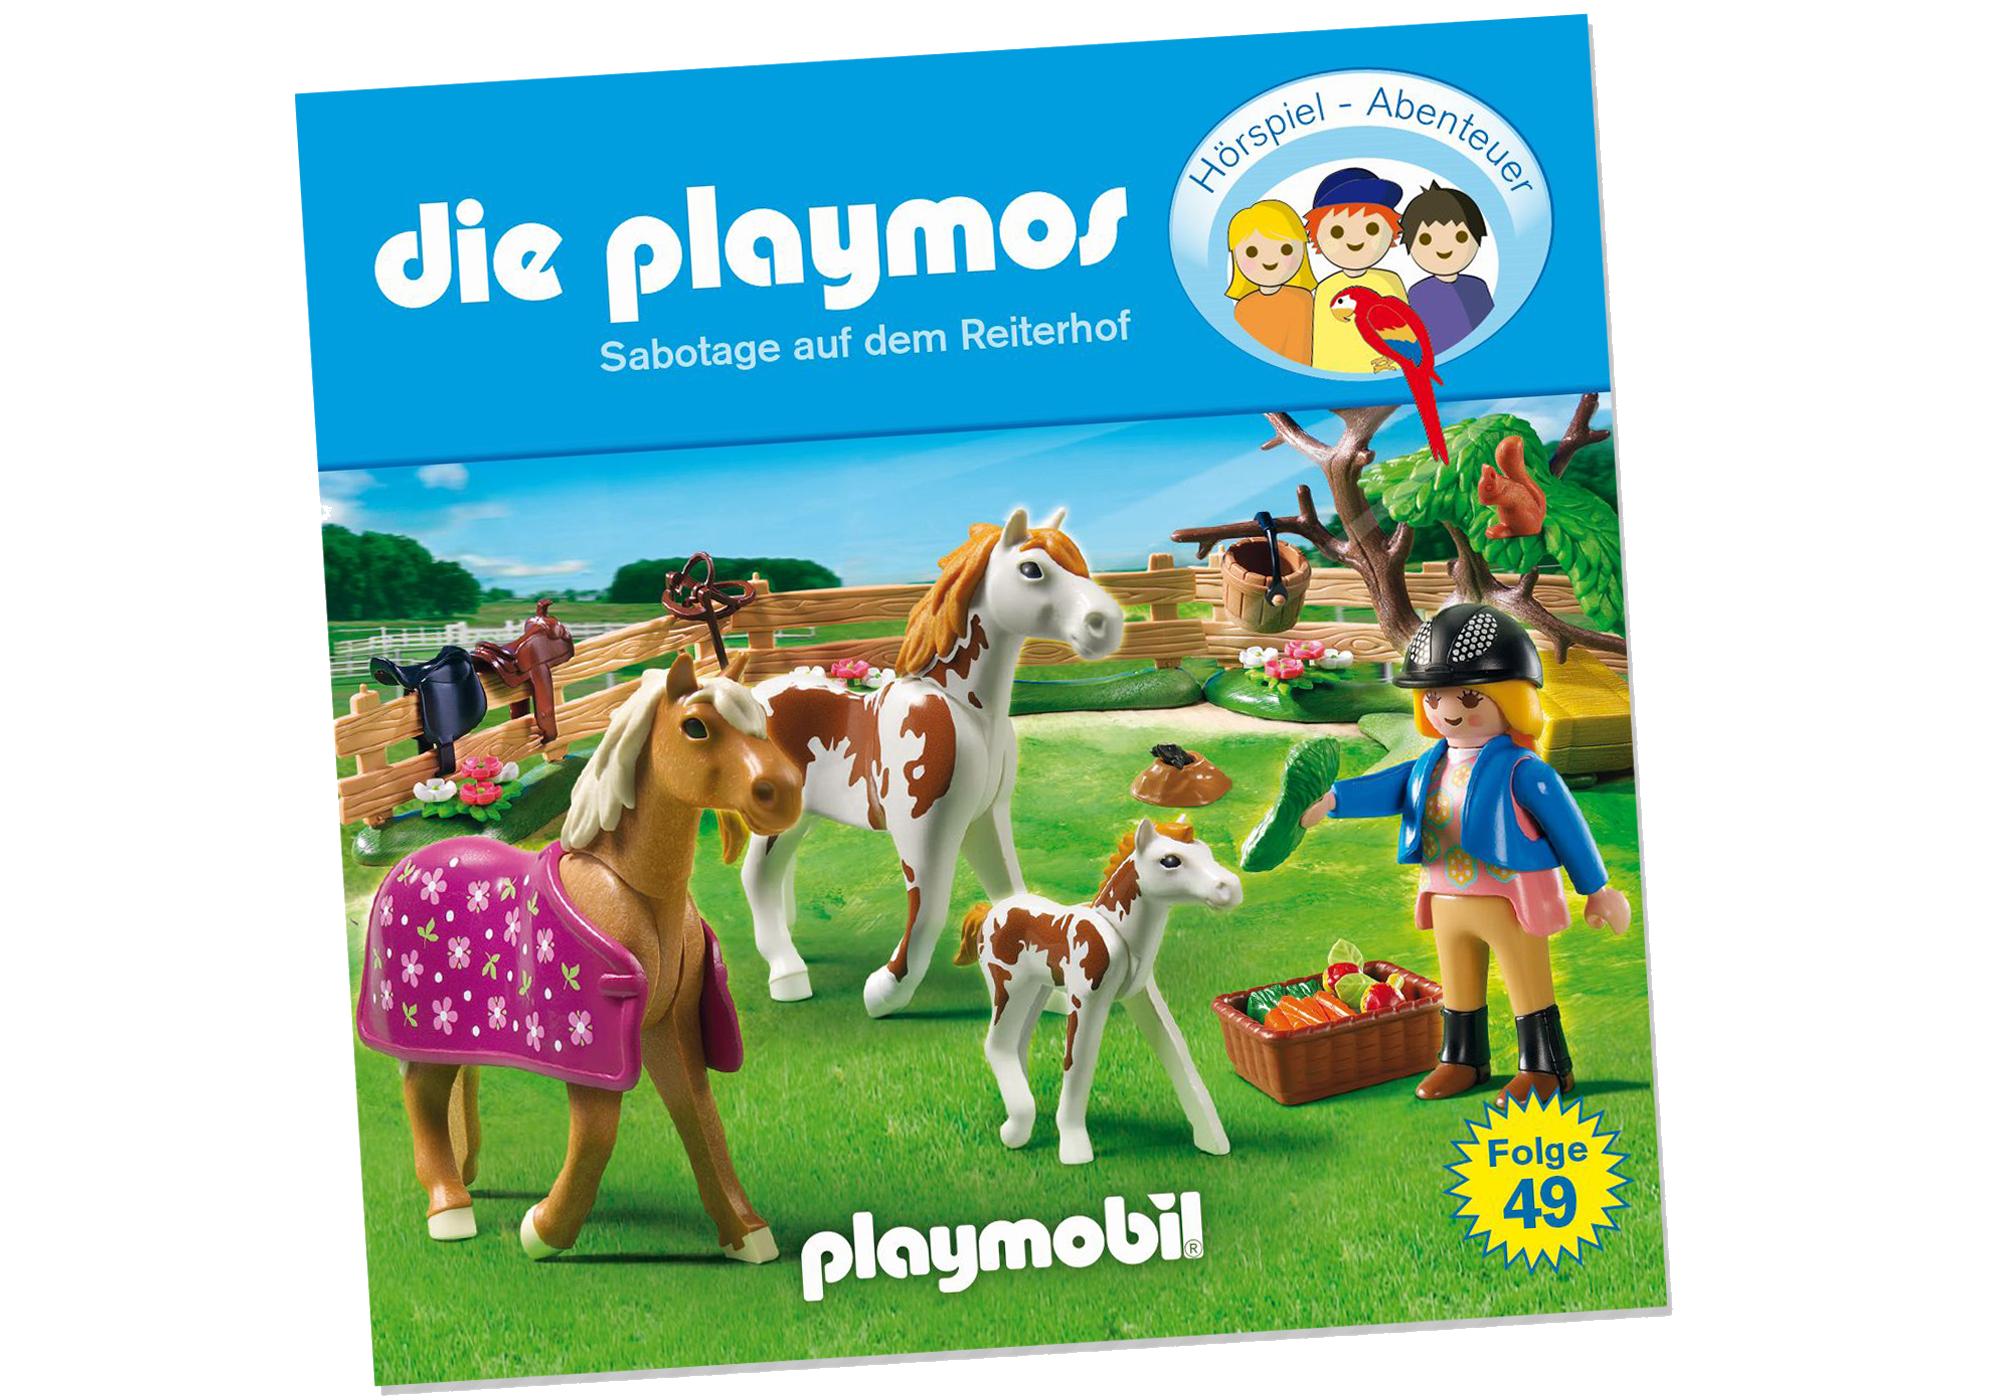 http://media.playmobil.com/i/playmobil/80256_product_detail/Sabotage auf dem Reiterhof - Folge 49